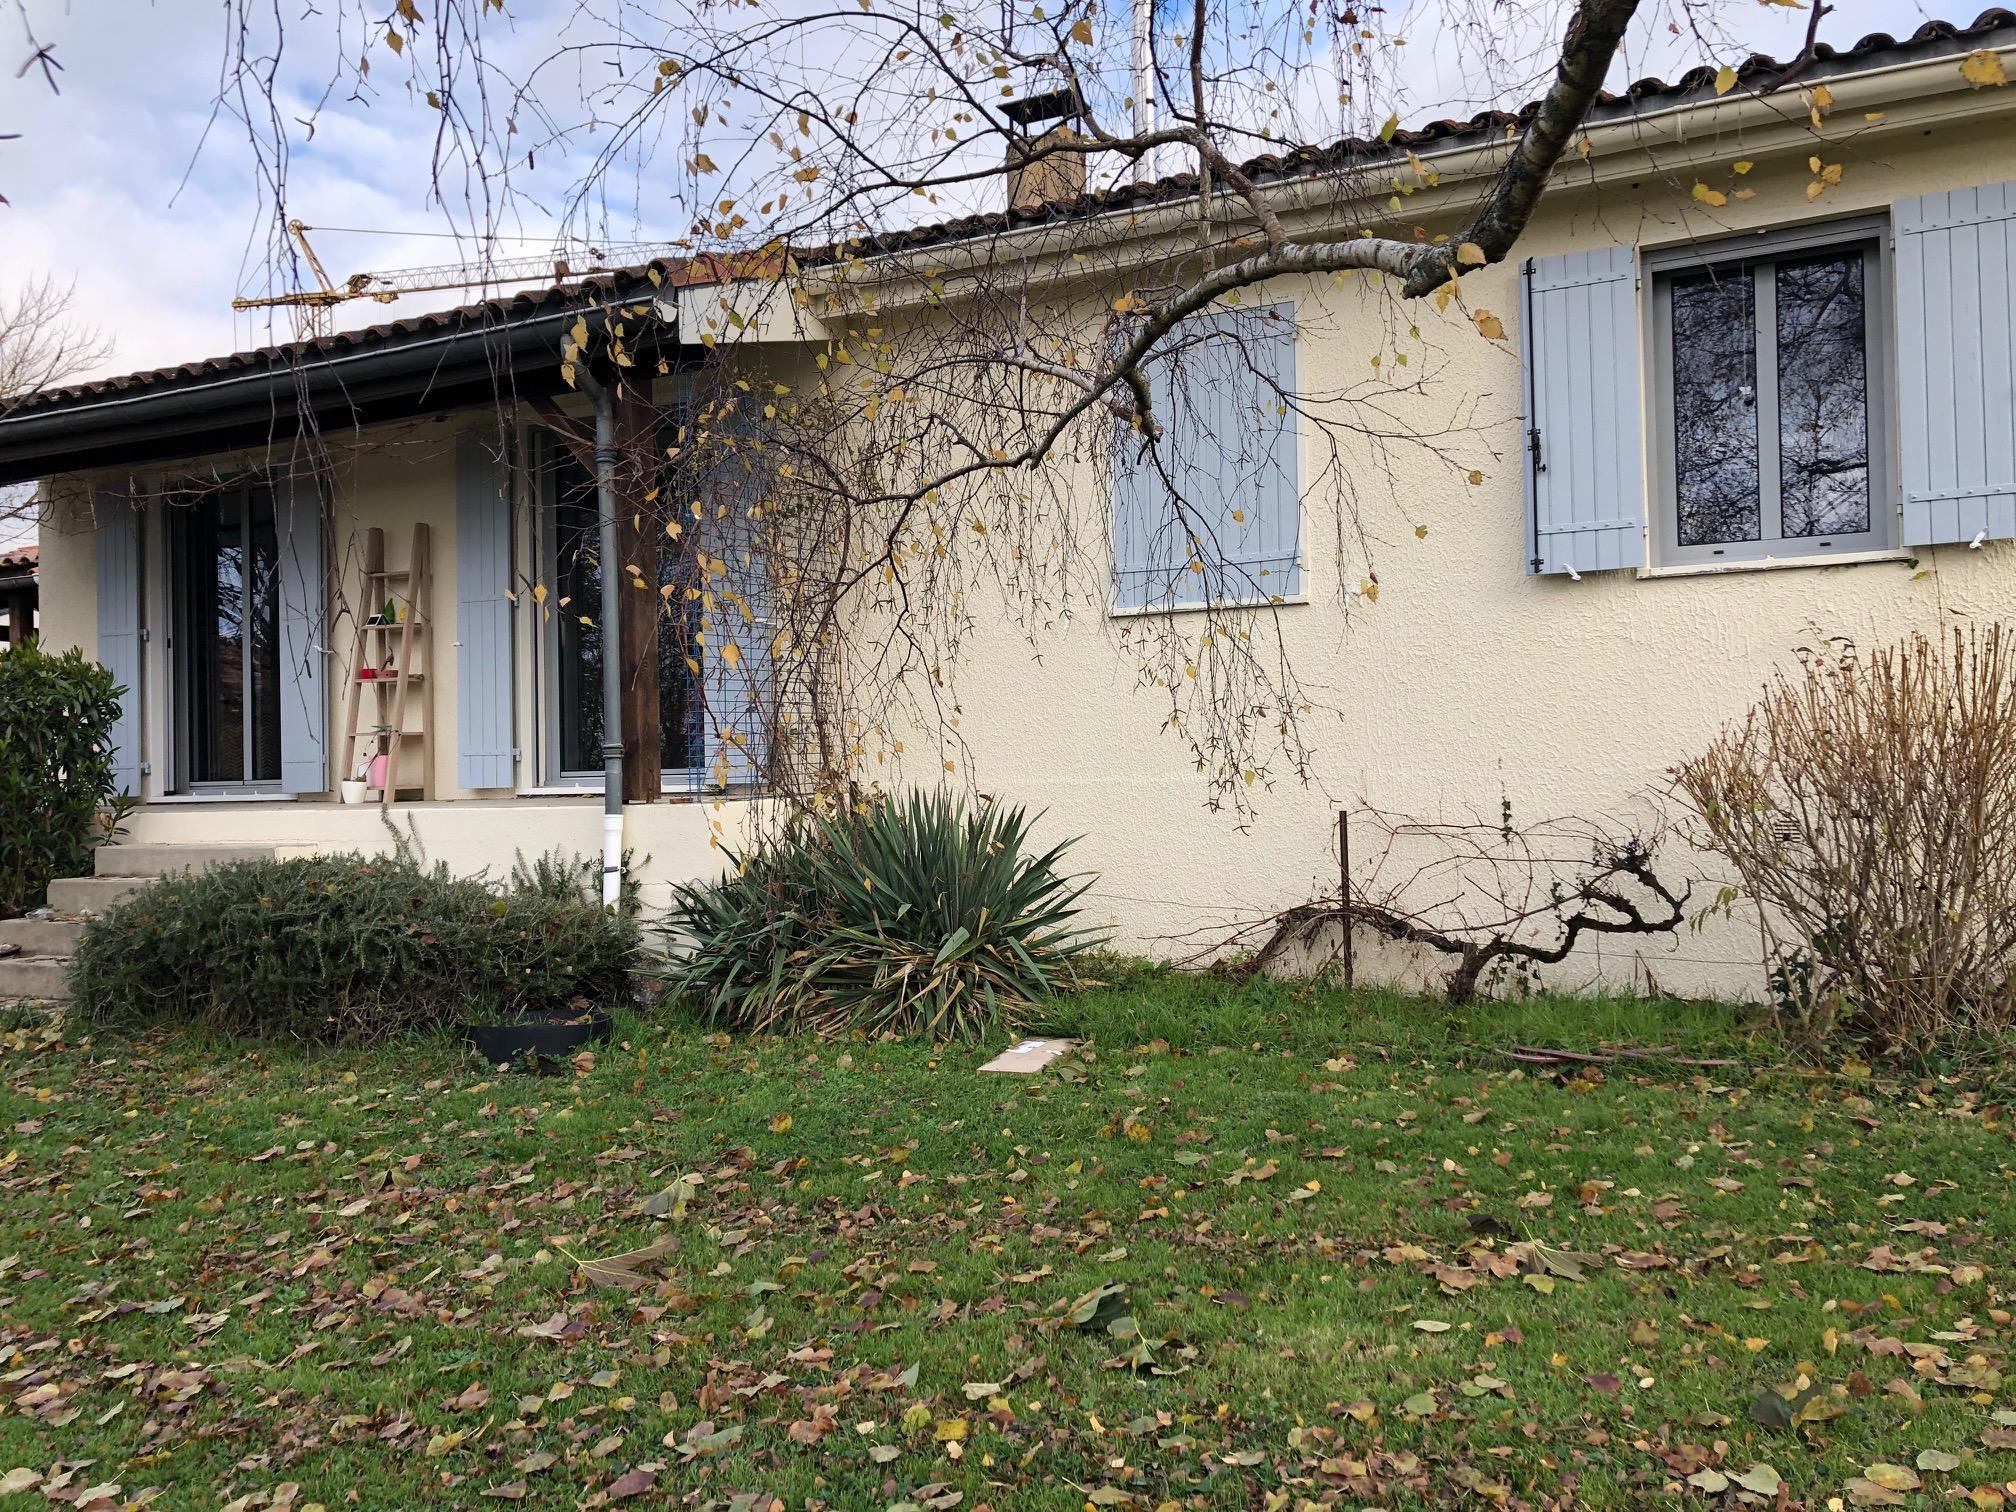 https://0501.nccdn.net/4_2/000/000/038/2d3/menuiseries-alu-renovation-maison-ouvrant-cach---toulouse.jpg